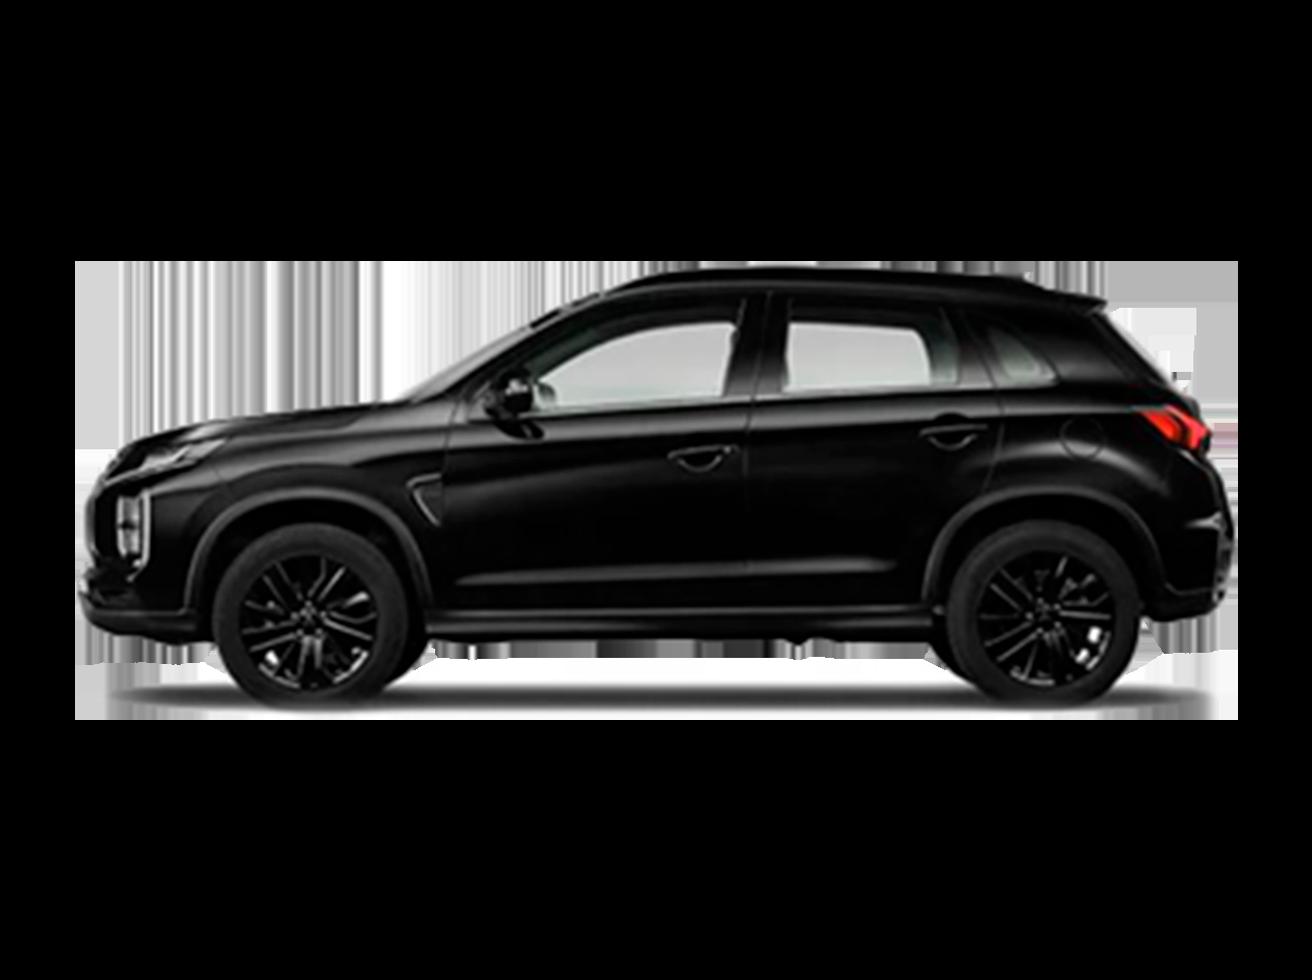 2.0 MIVEC FLEX HPE BLACK EDITION AWD AUTOMÁTICO